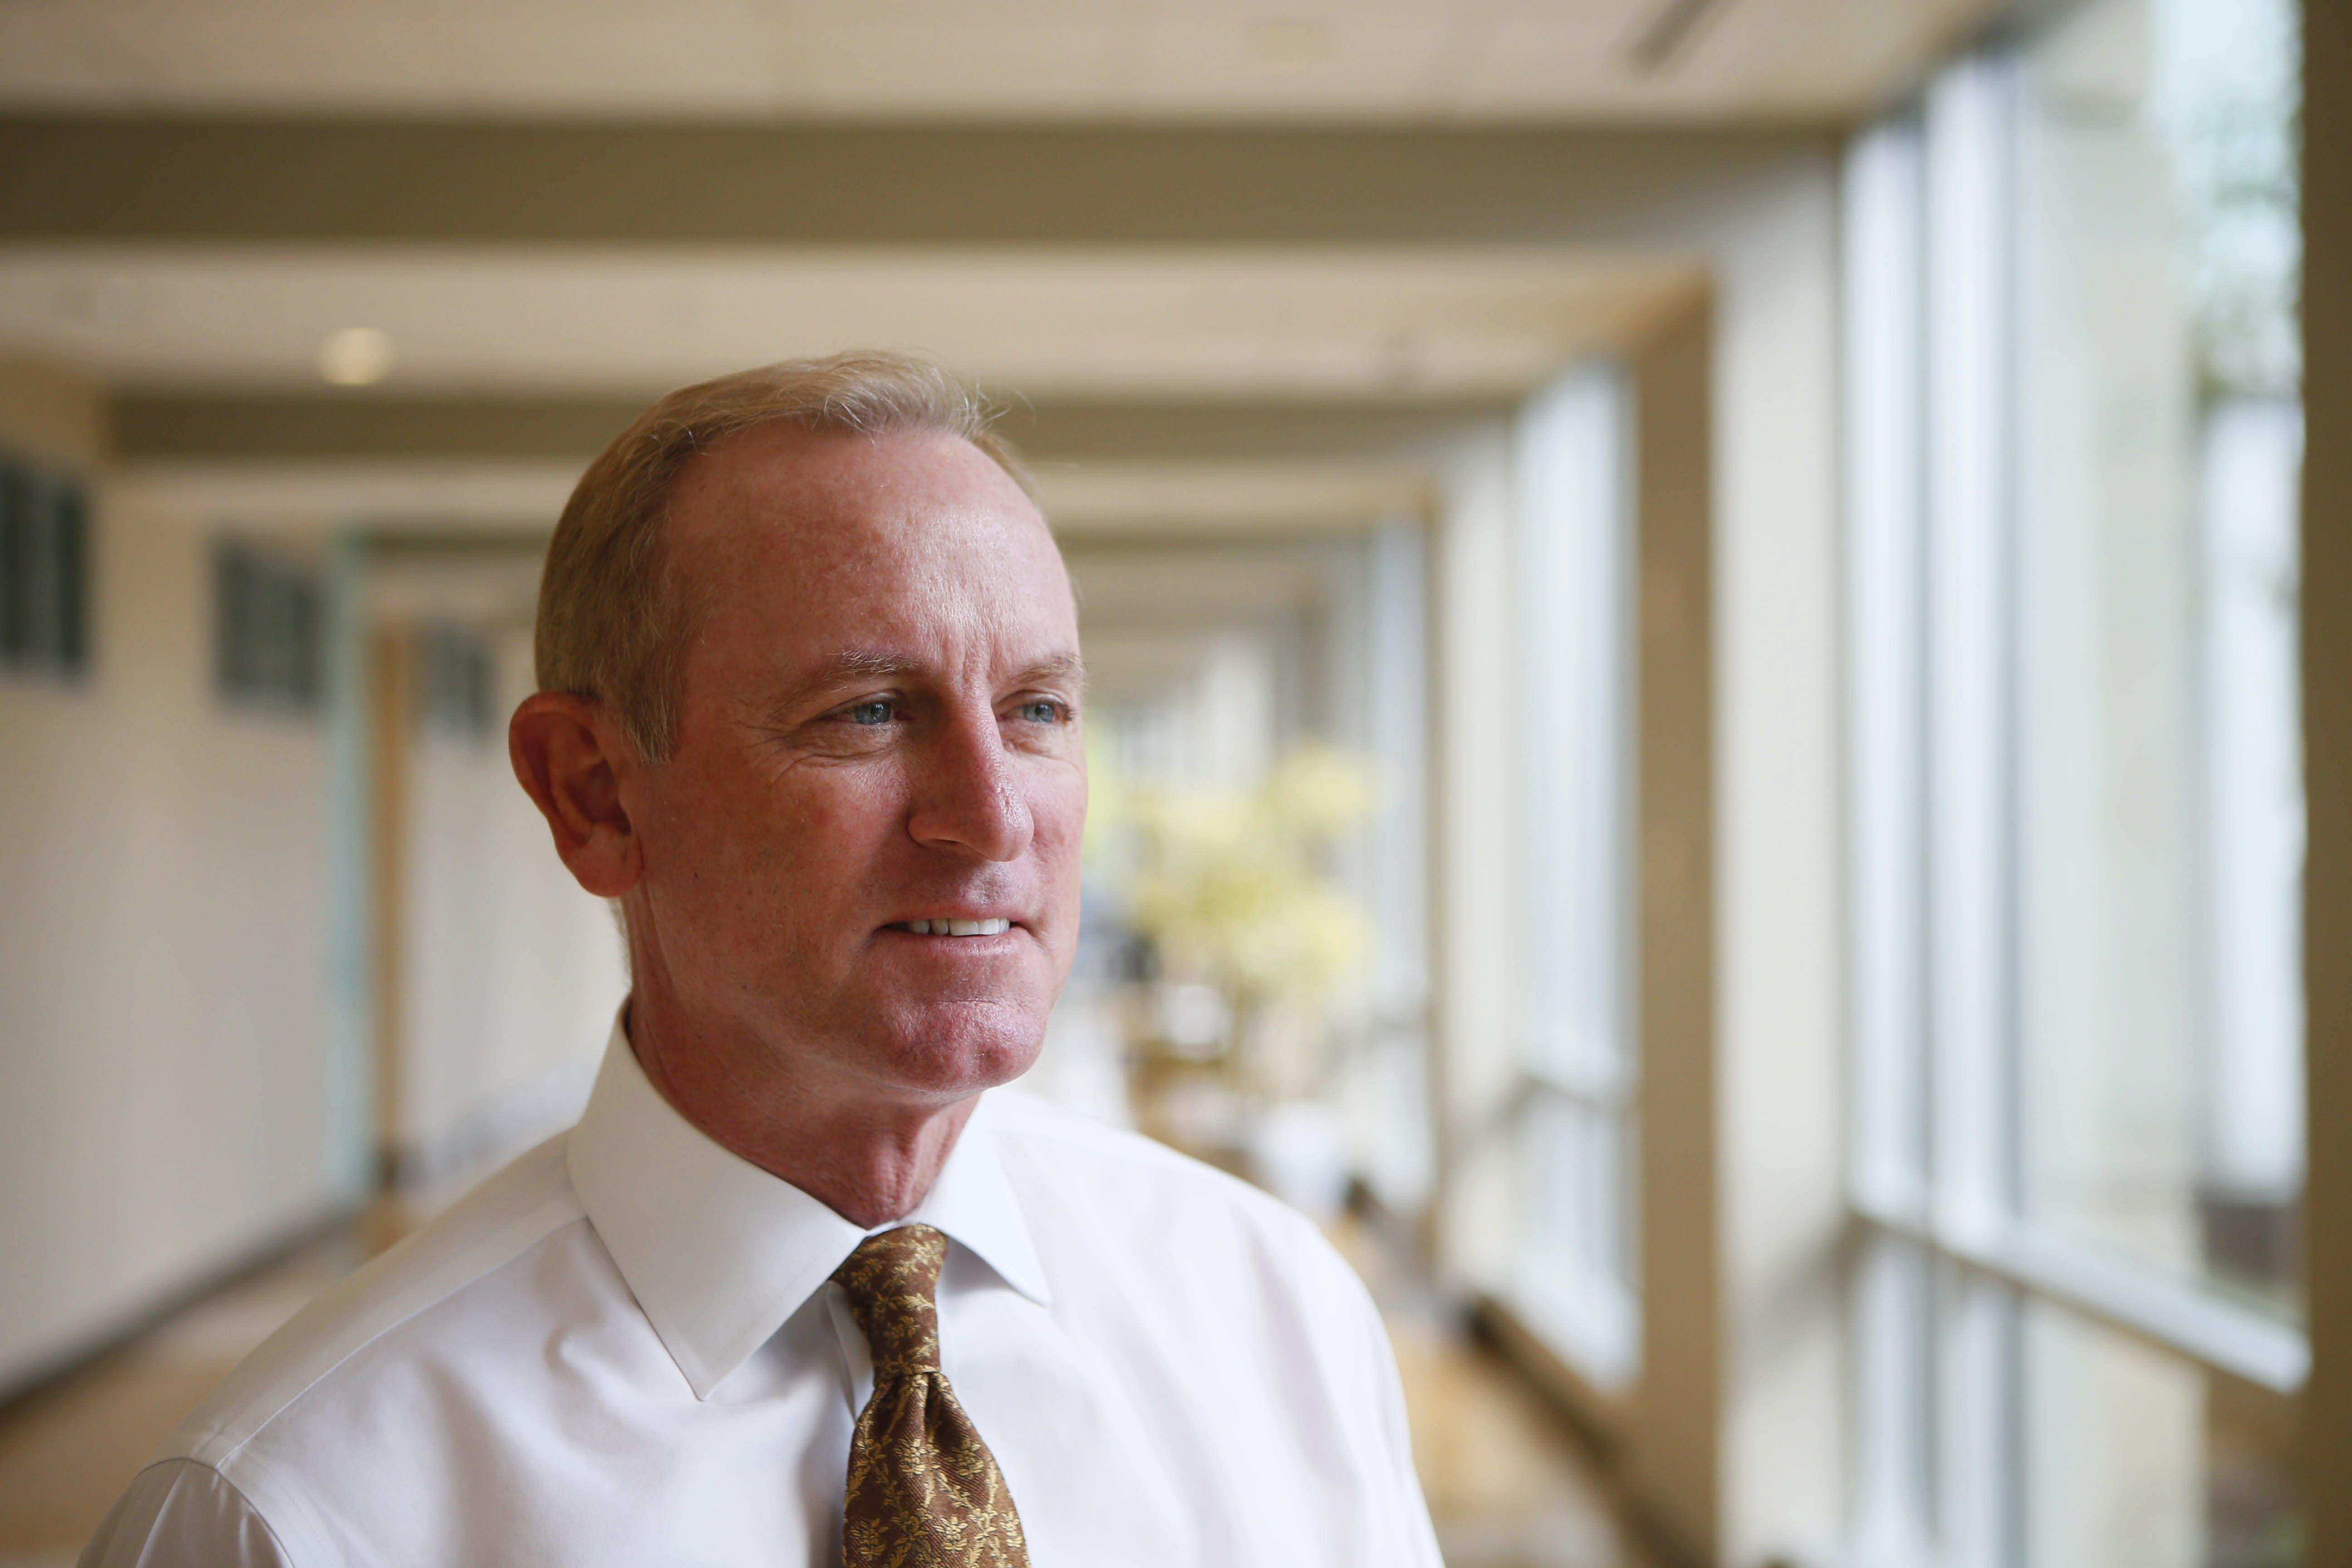 David Anderson, CEO of BlueCross BlueShield of WNY, Monday, Sept. 9, 2013.   (Derek Gee/Buffalo News)